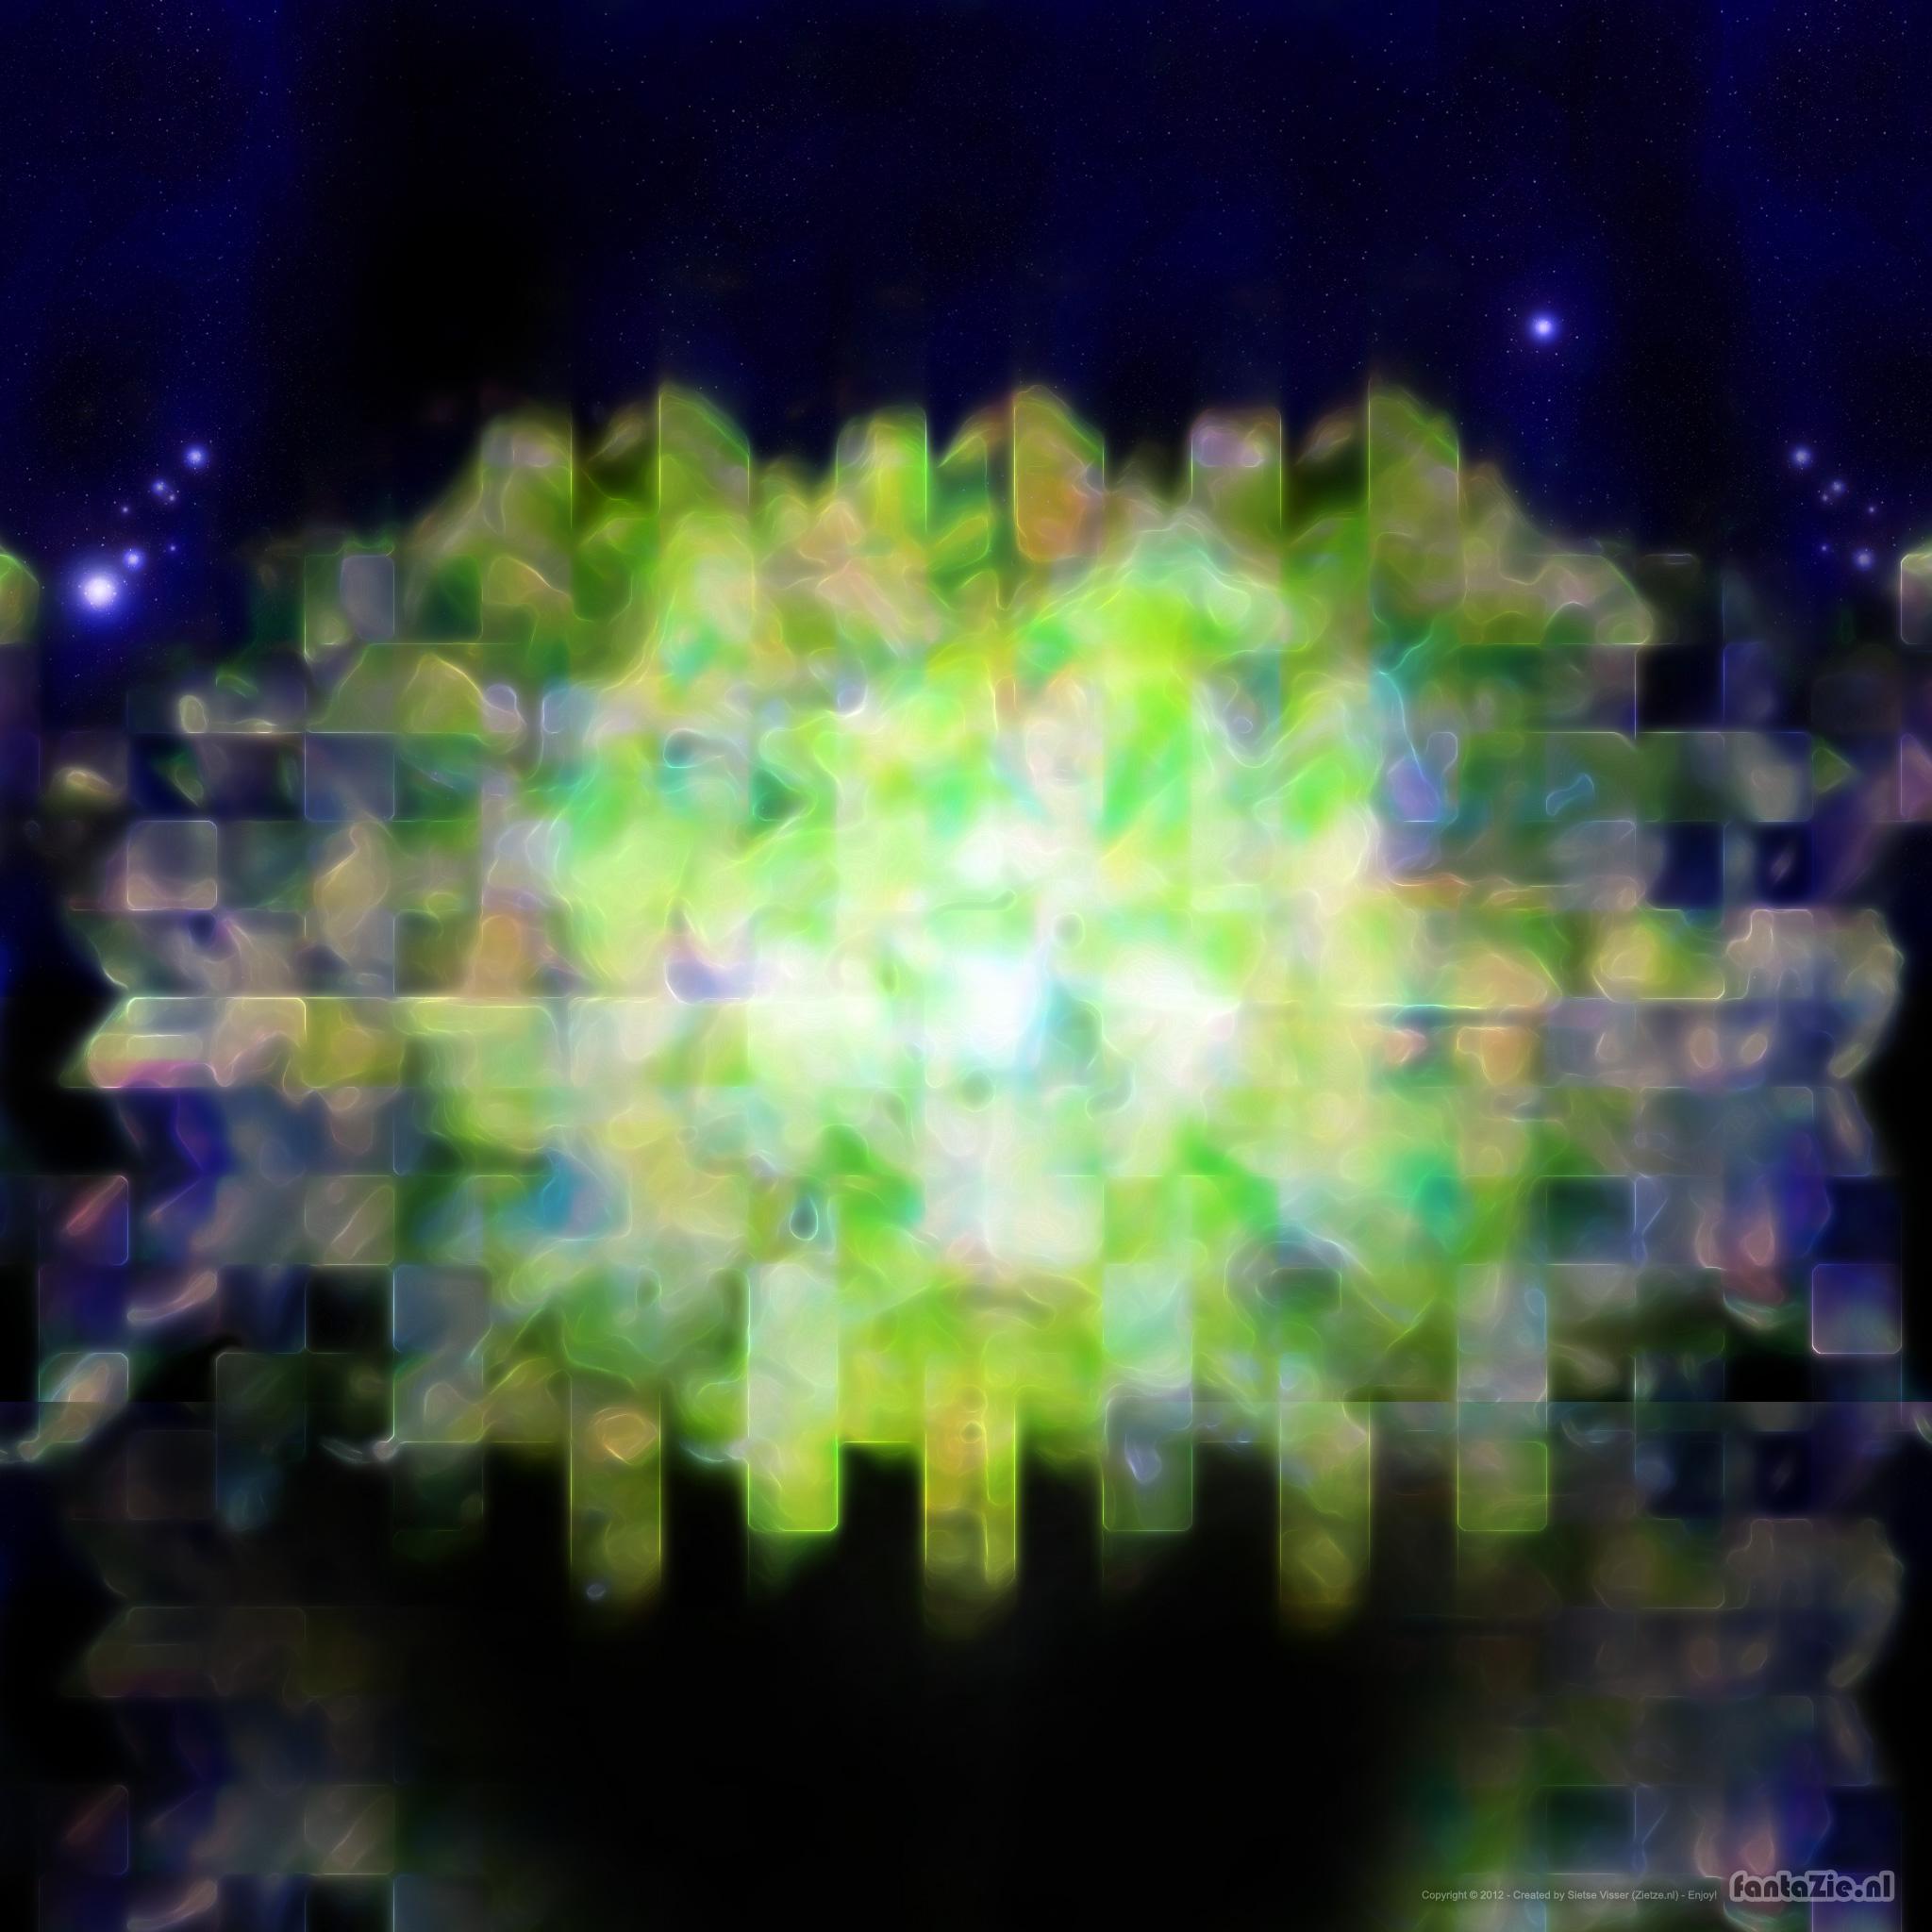 Spirit Gate iPad3 Retina Wallpaper 2048x2048